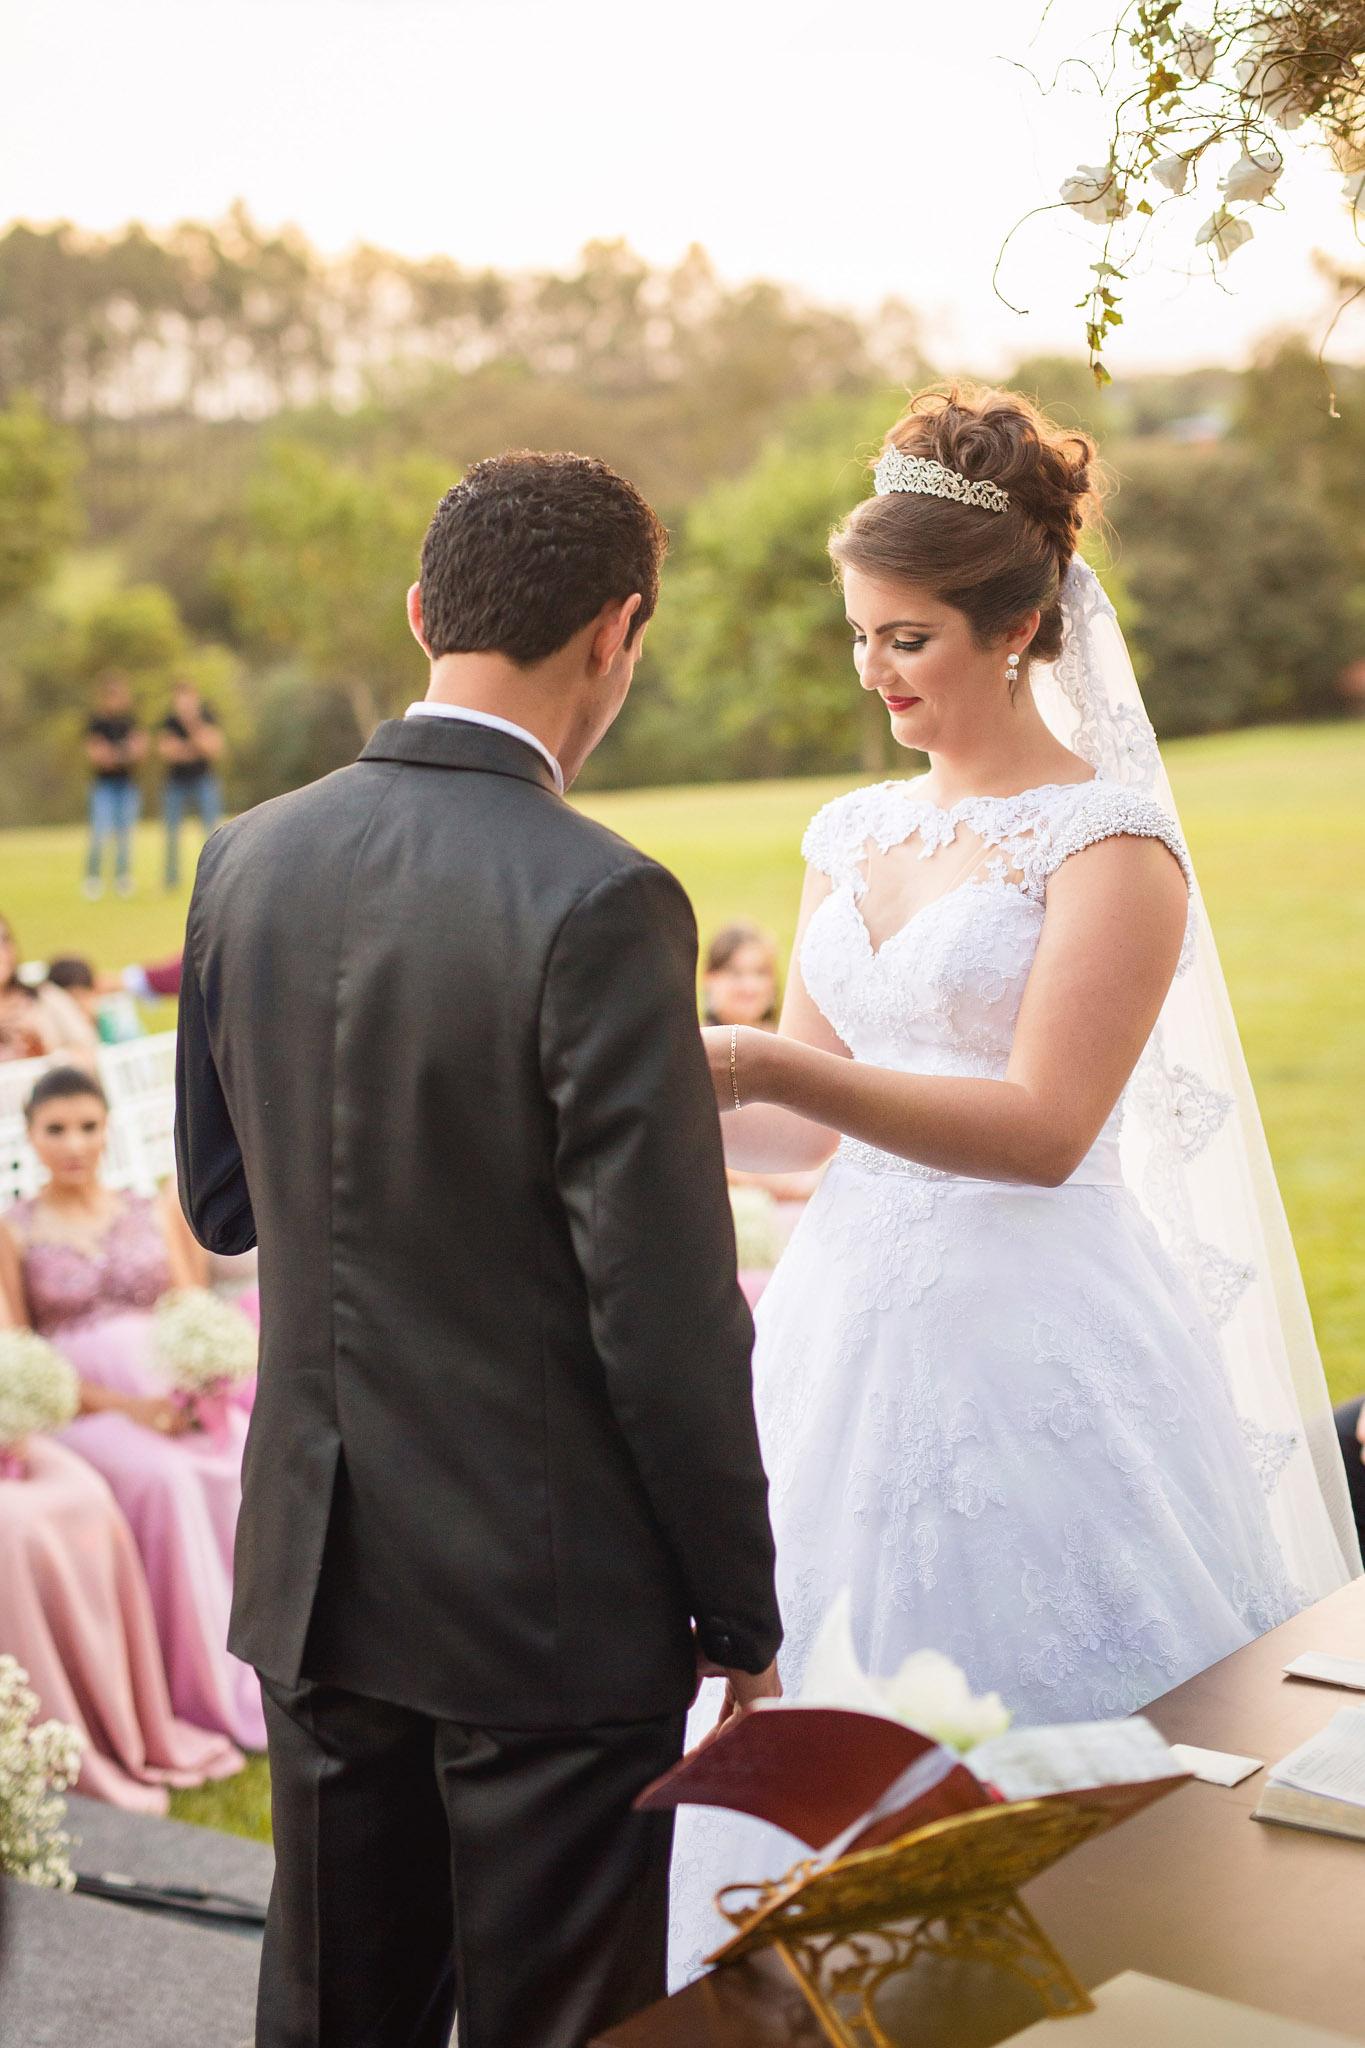 Wedding_Travellers_Destination_Wedding_Photography-123.jpg